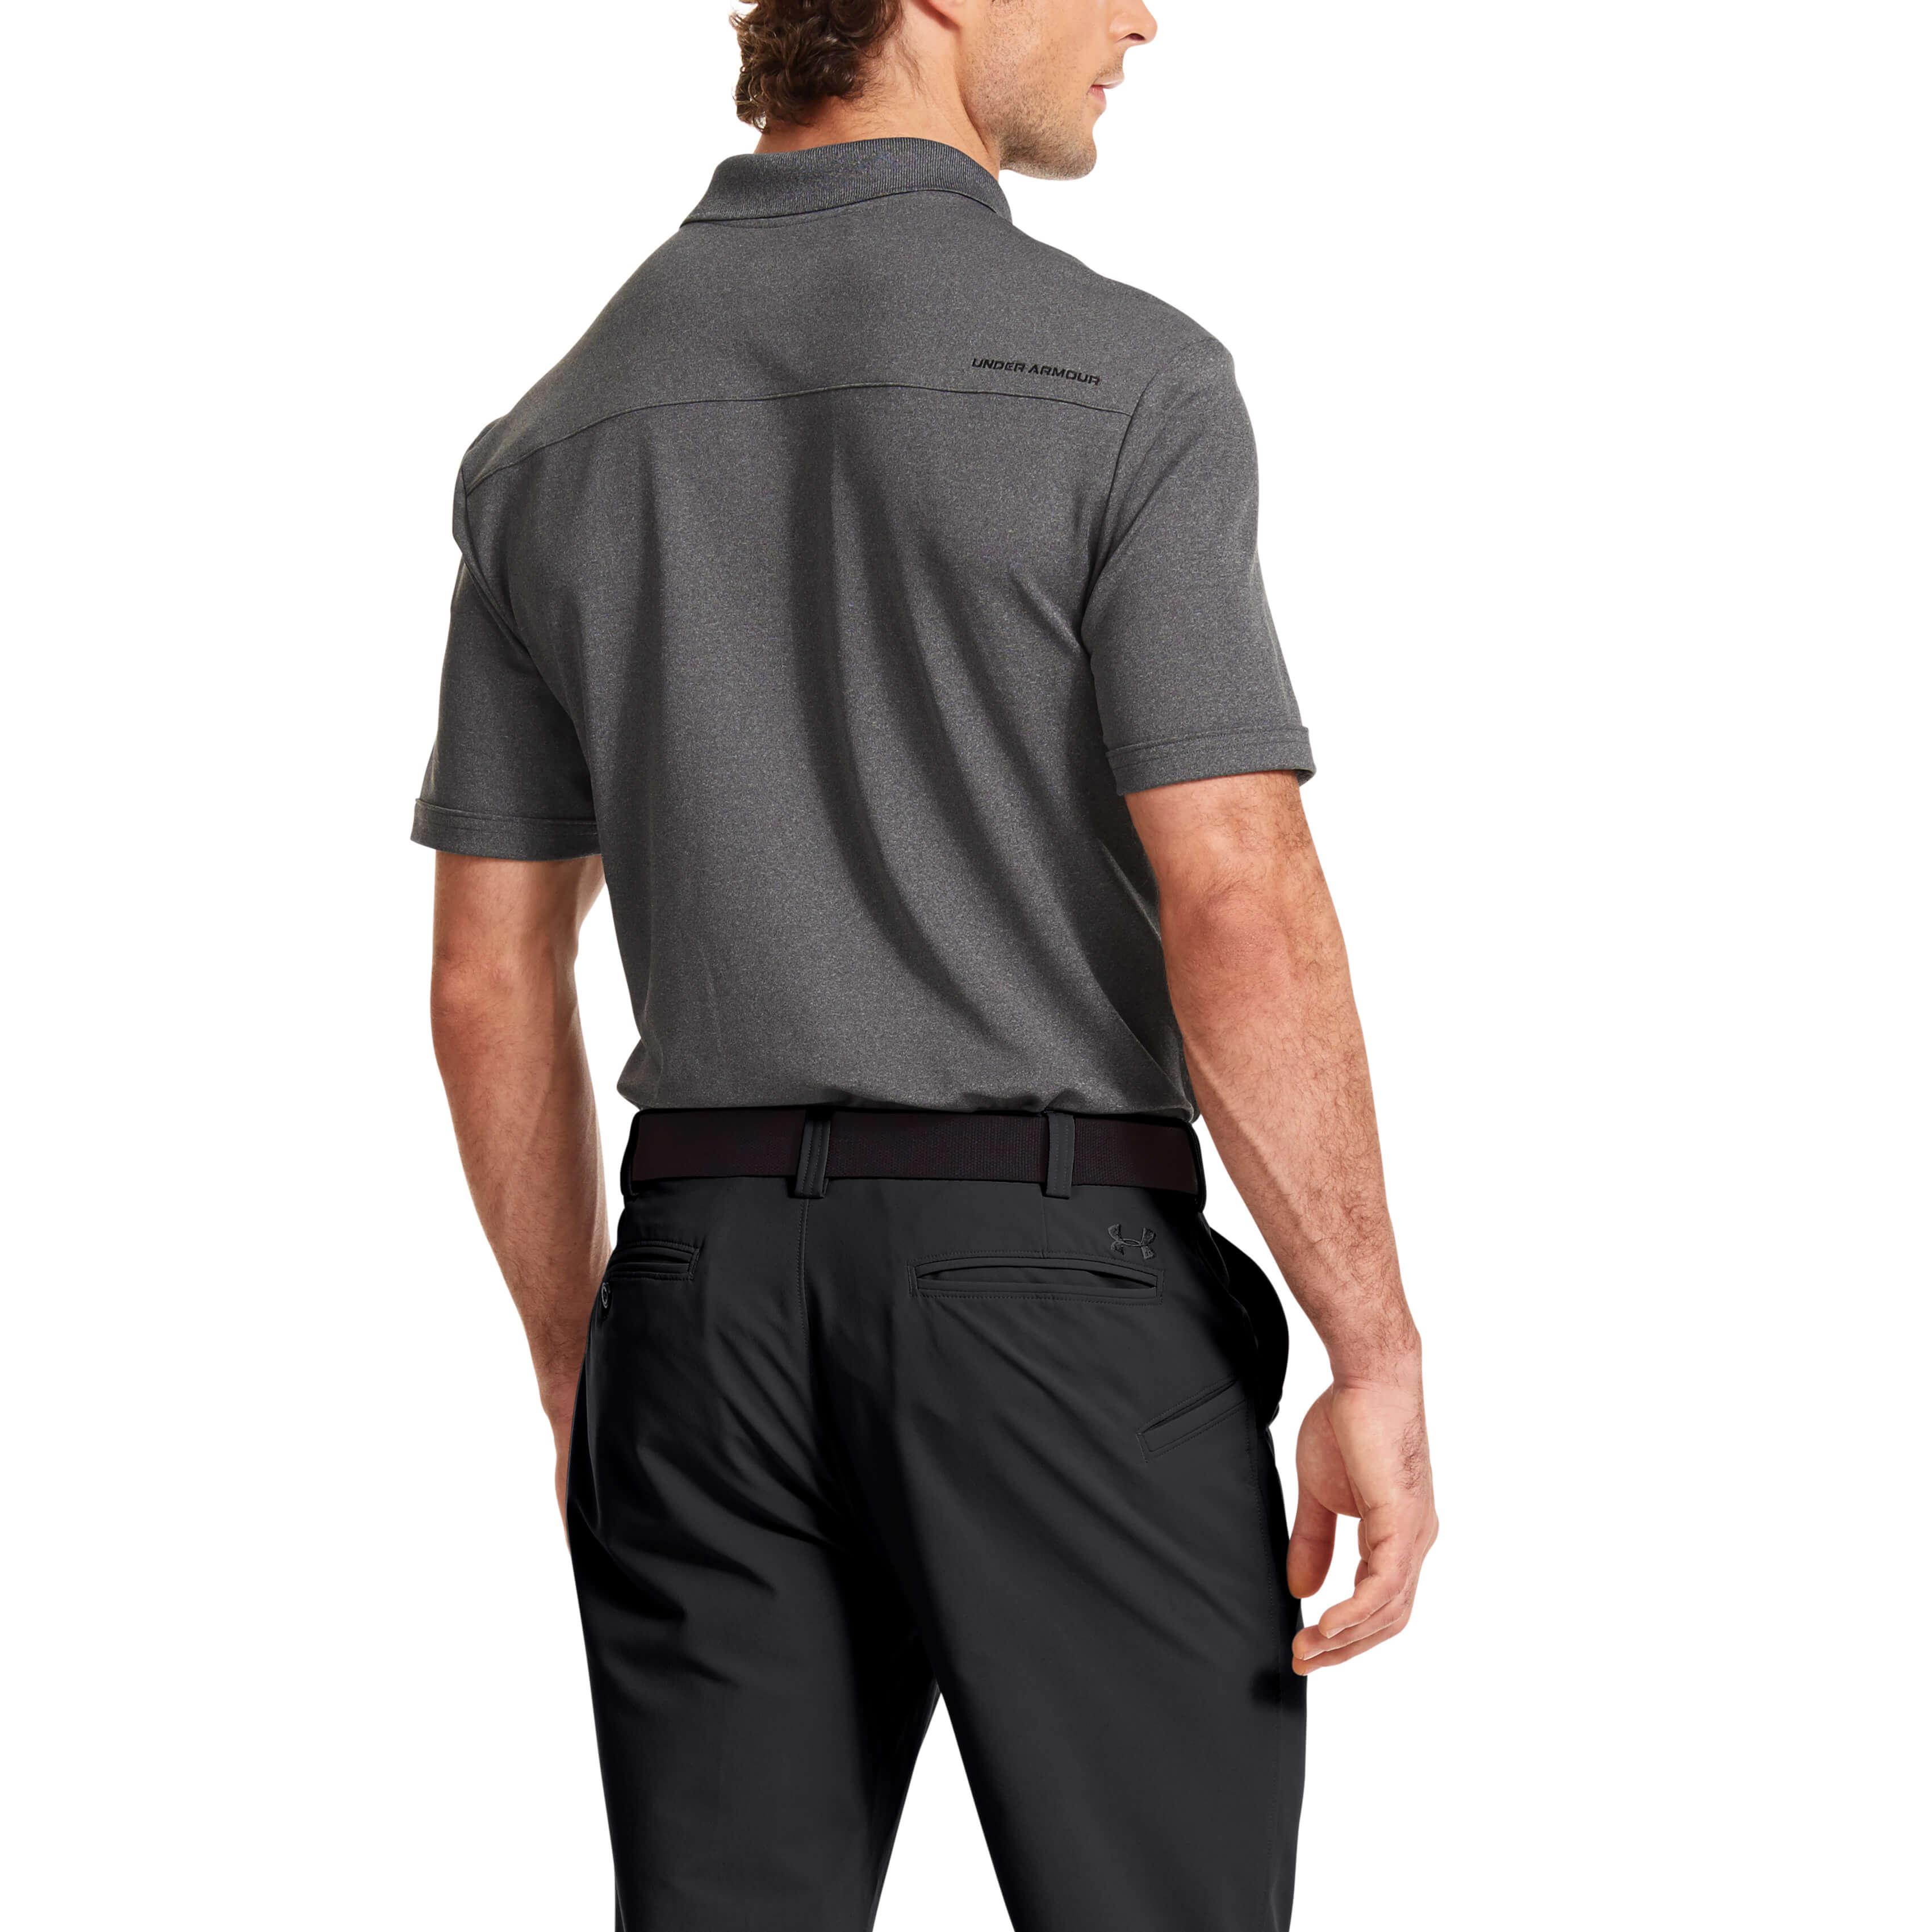 Under-Armour-Mens-Medal-Play-Performance-Polo-Shirt-UA-Golf-Short-Sleeve thumbnail 16